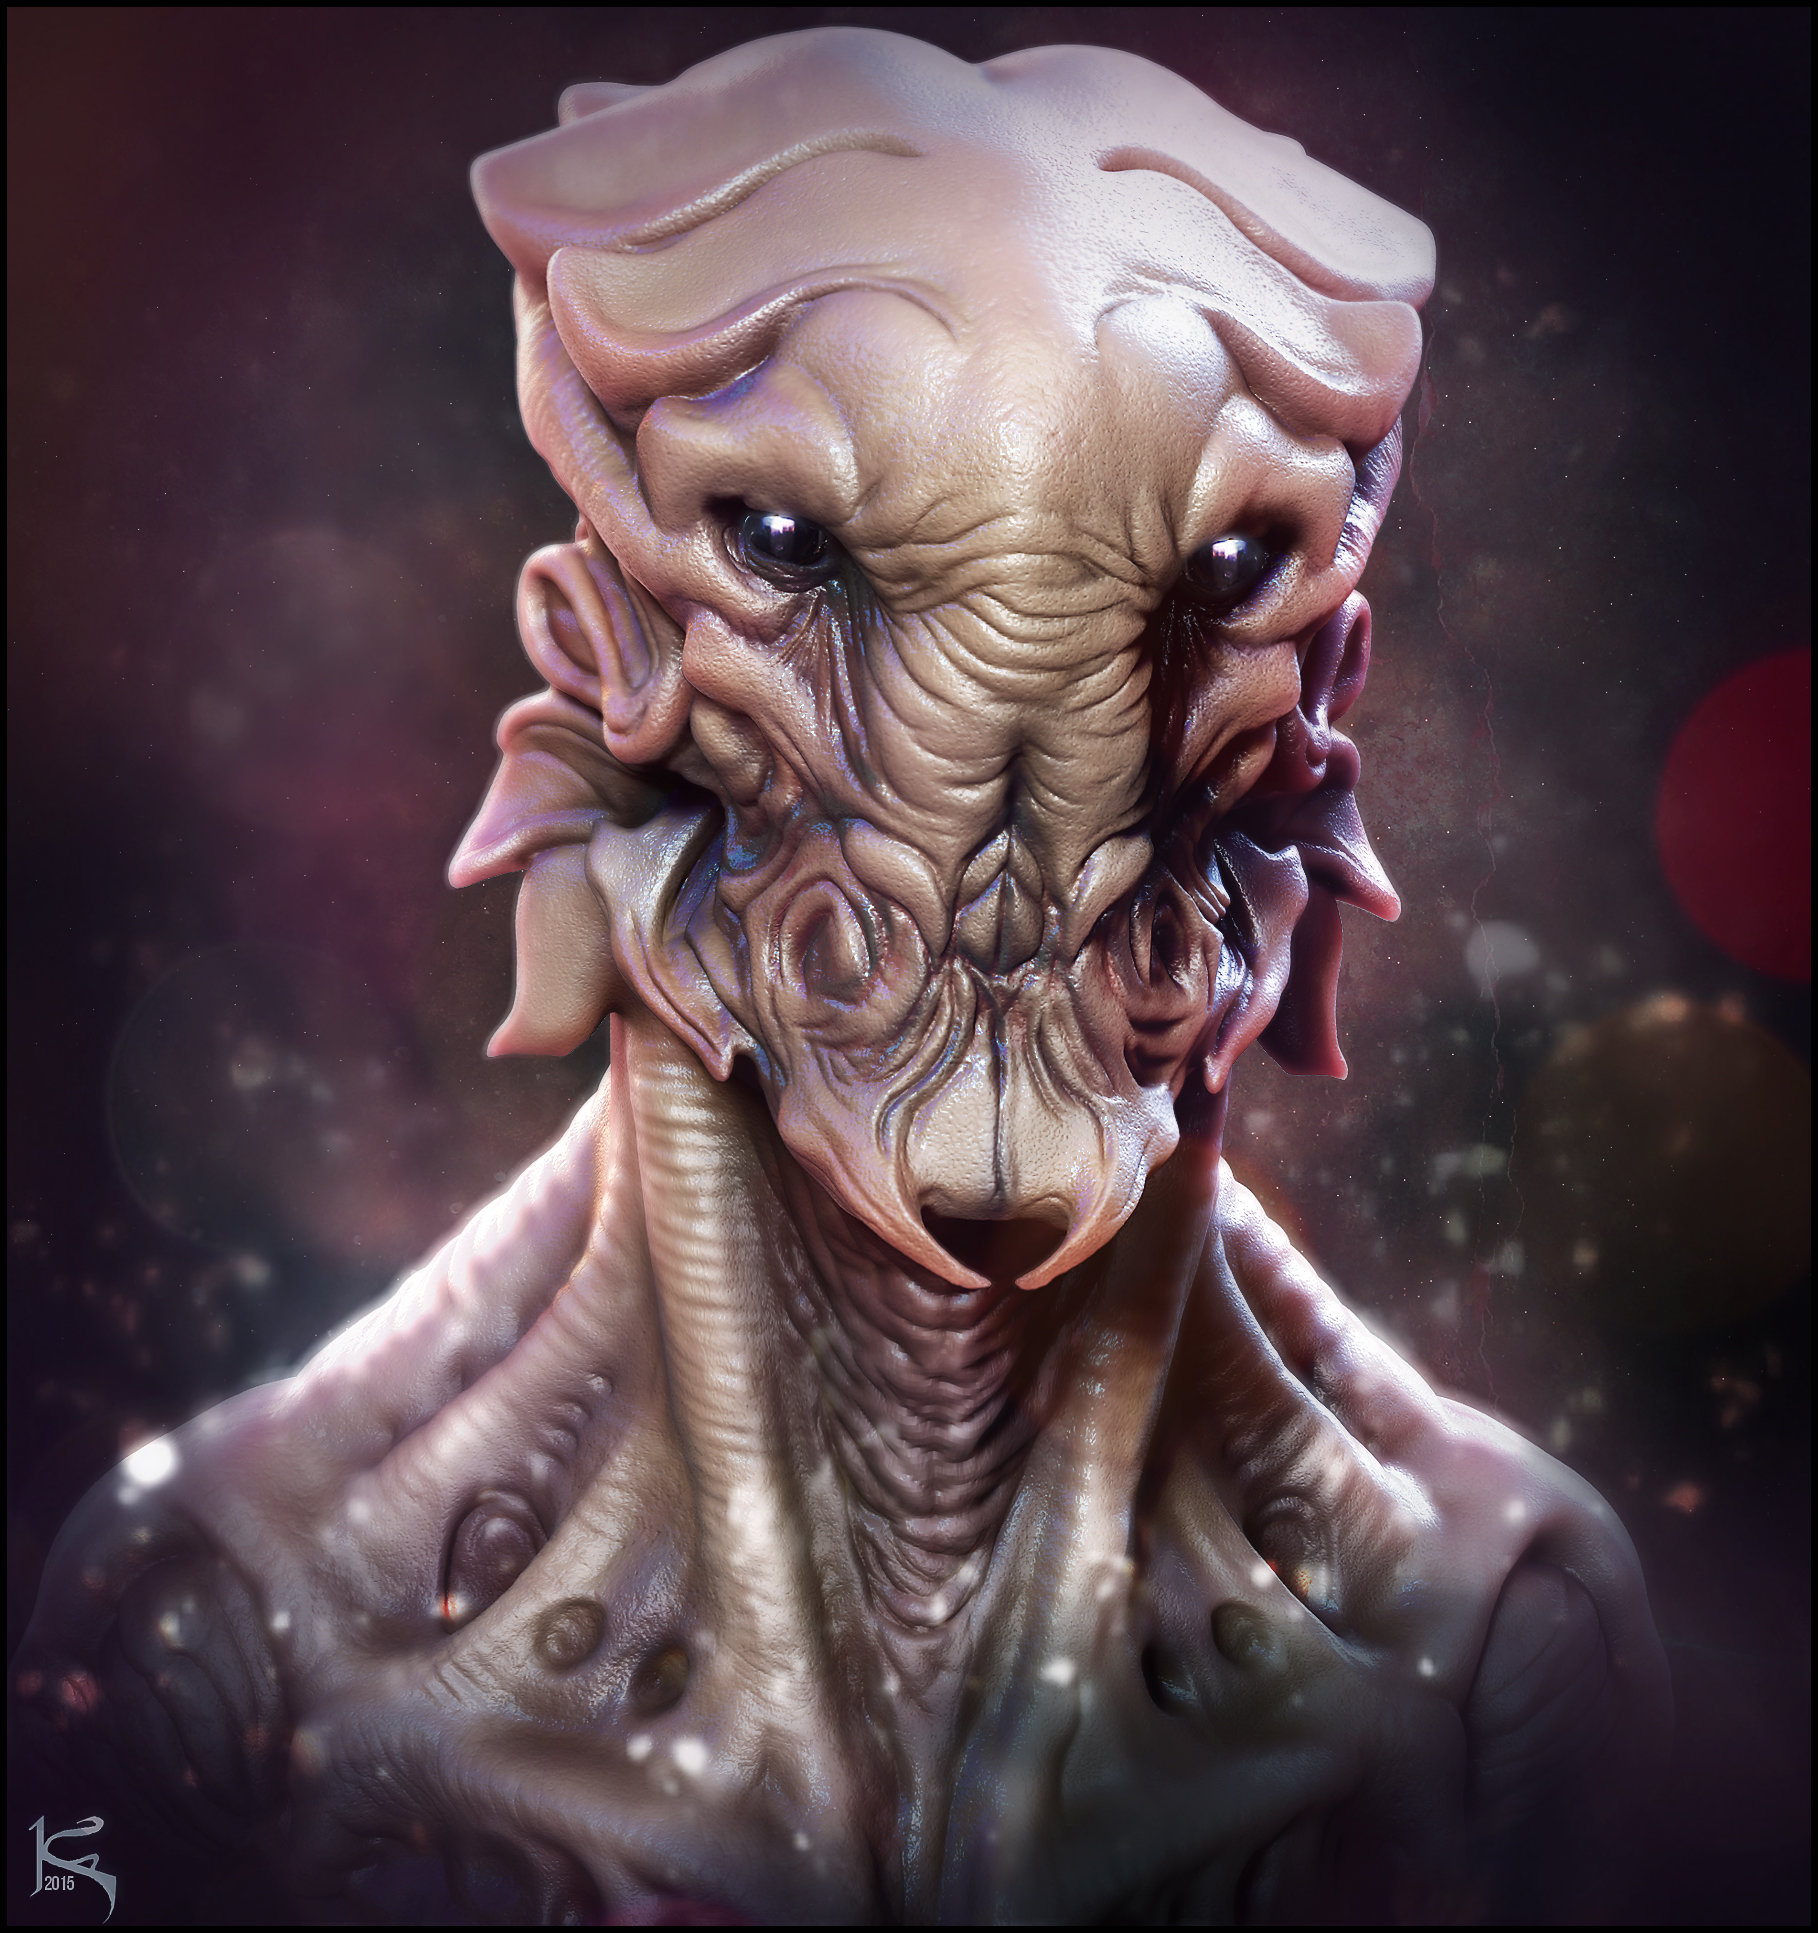 kenny carmody - aris kolokontes fan art  3